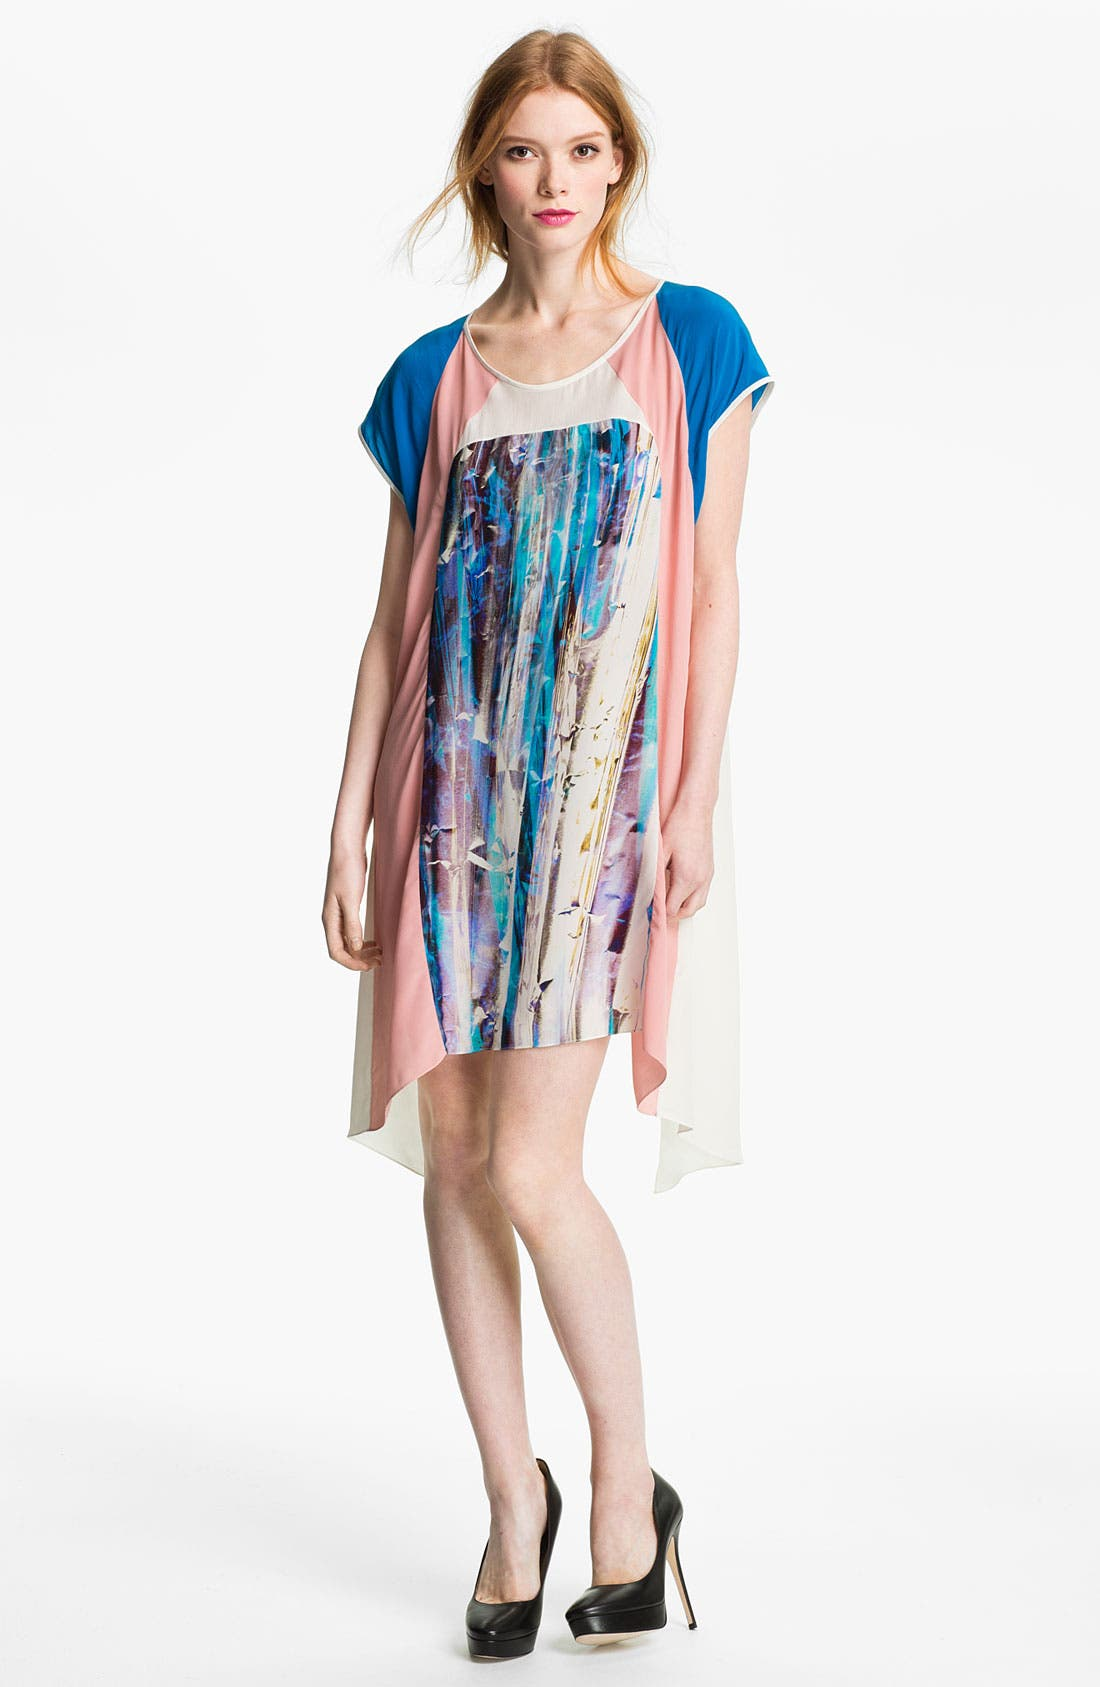 Alternate Image 1 Selected - Rebecca Minkoff 'Baseball' Colorblock Dress